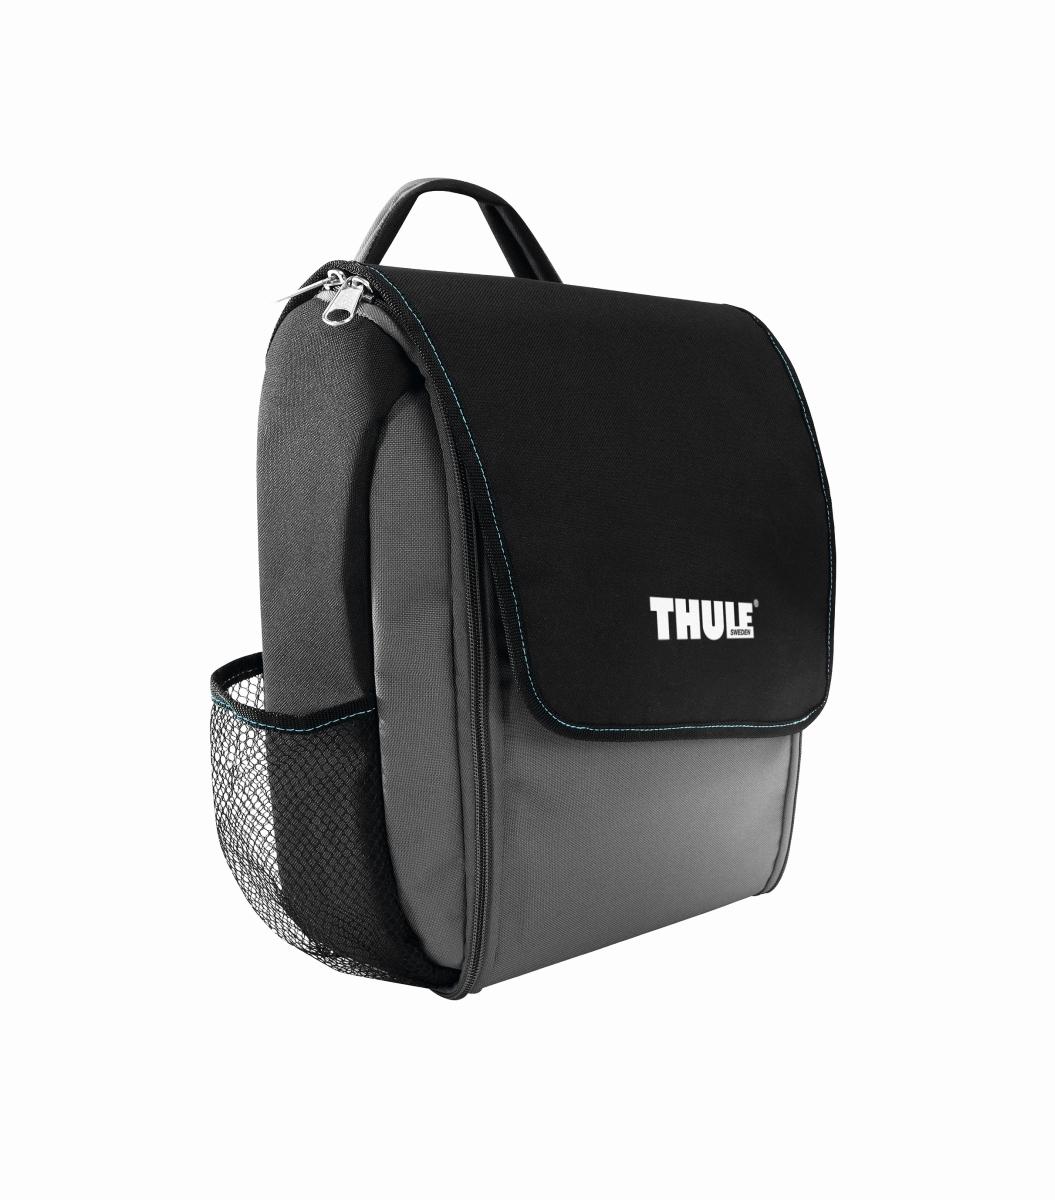 Thule Toilettenset, schwarz